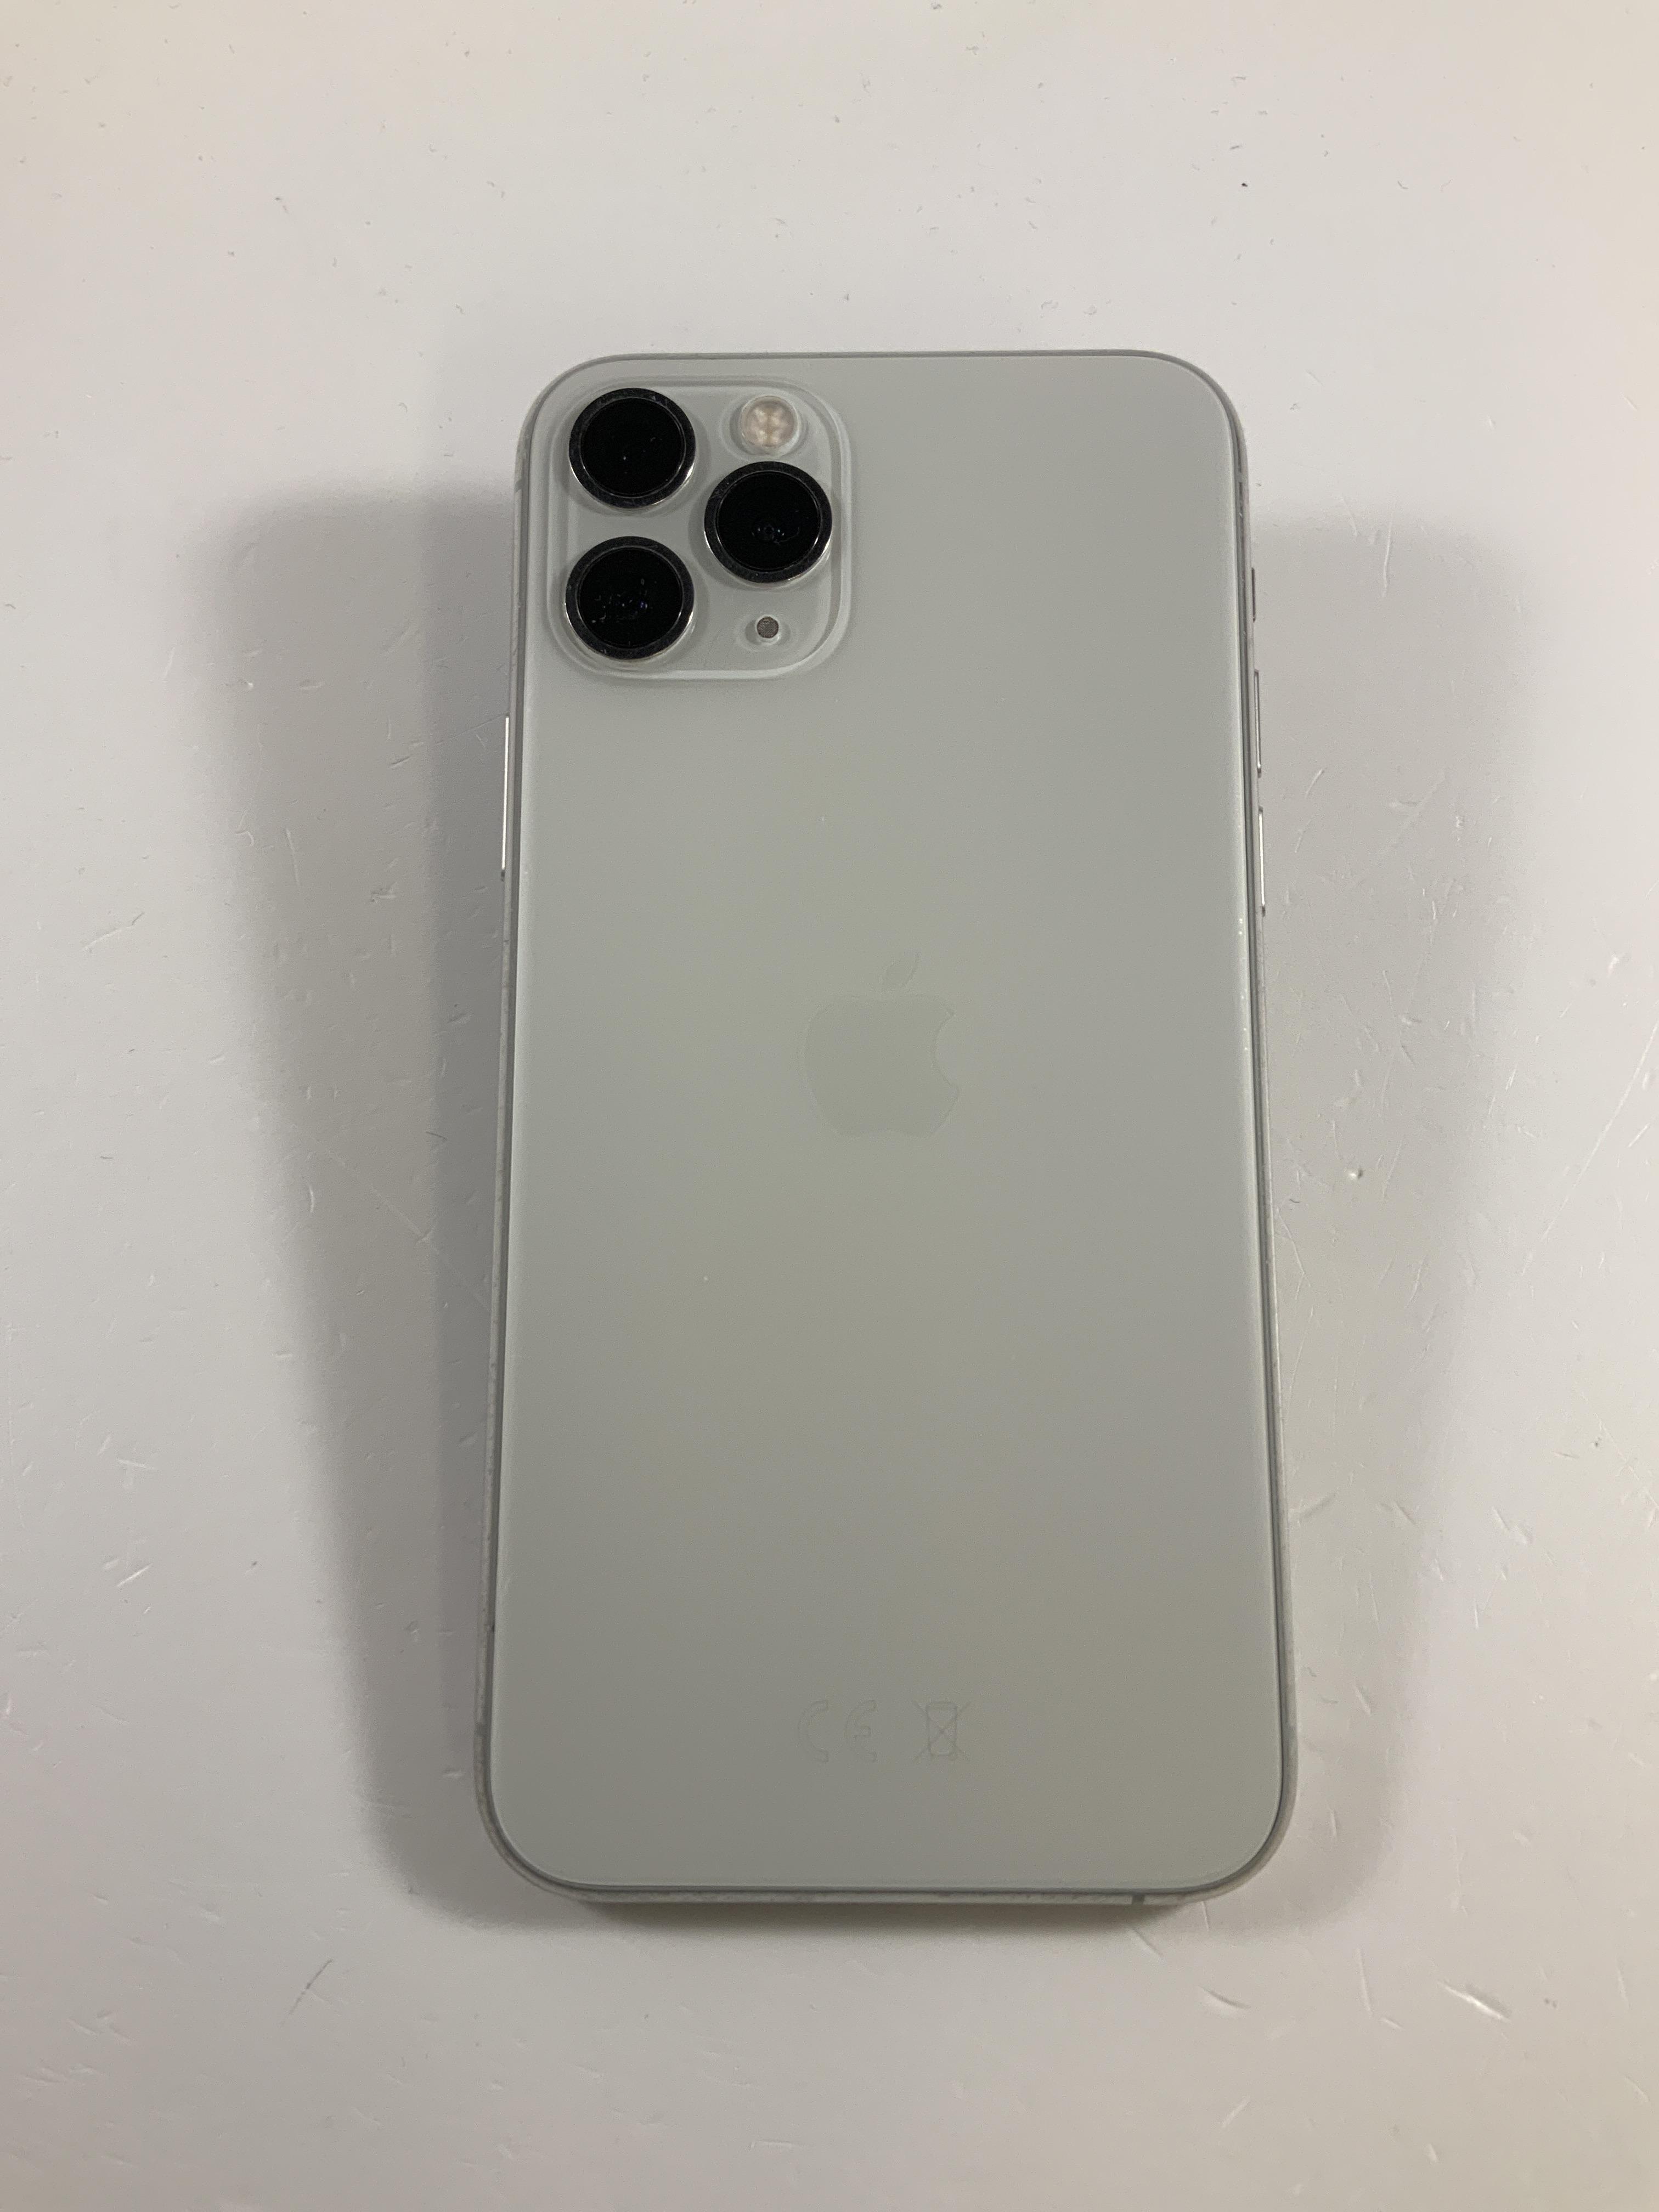 iPhone 11 Pro 64GB, 64GB, Silver, Afbeelding 2